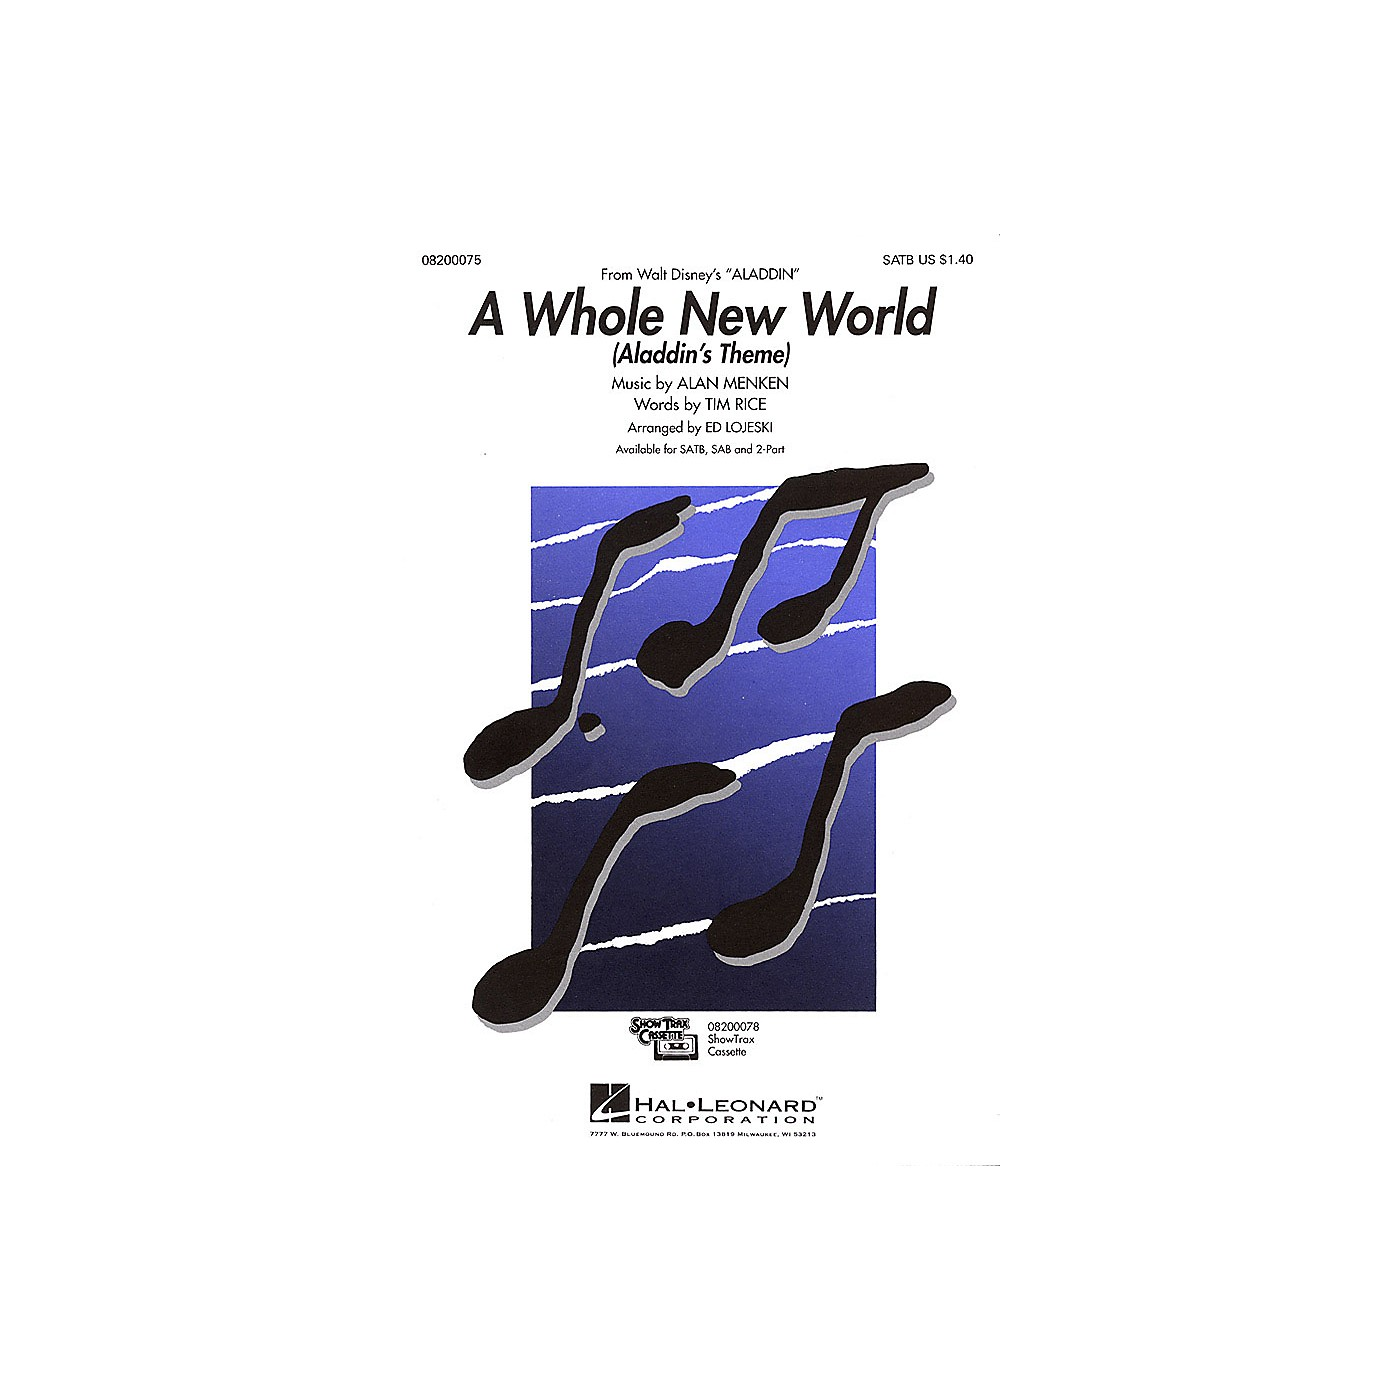 Hal Leonard A Whole New World - Aladdin's Theme (from Aladdin) SAB Arranged by Ed Lojeski thumbnail